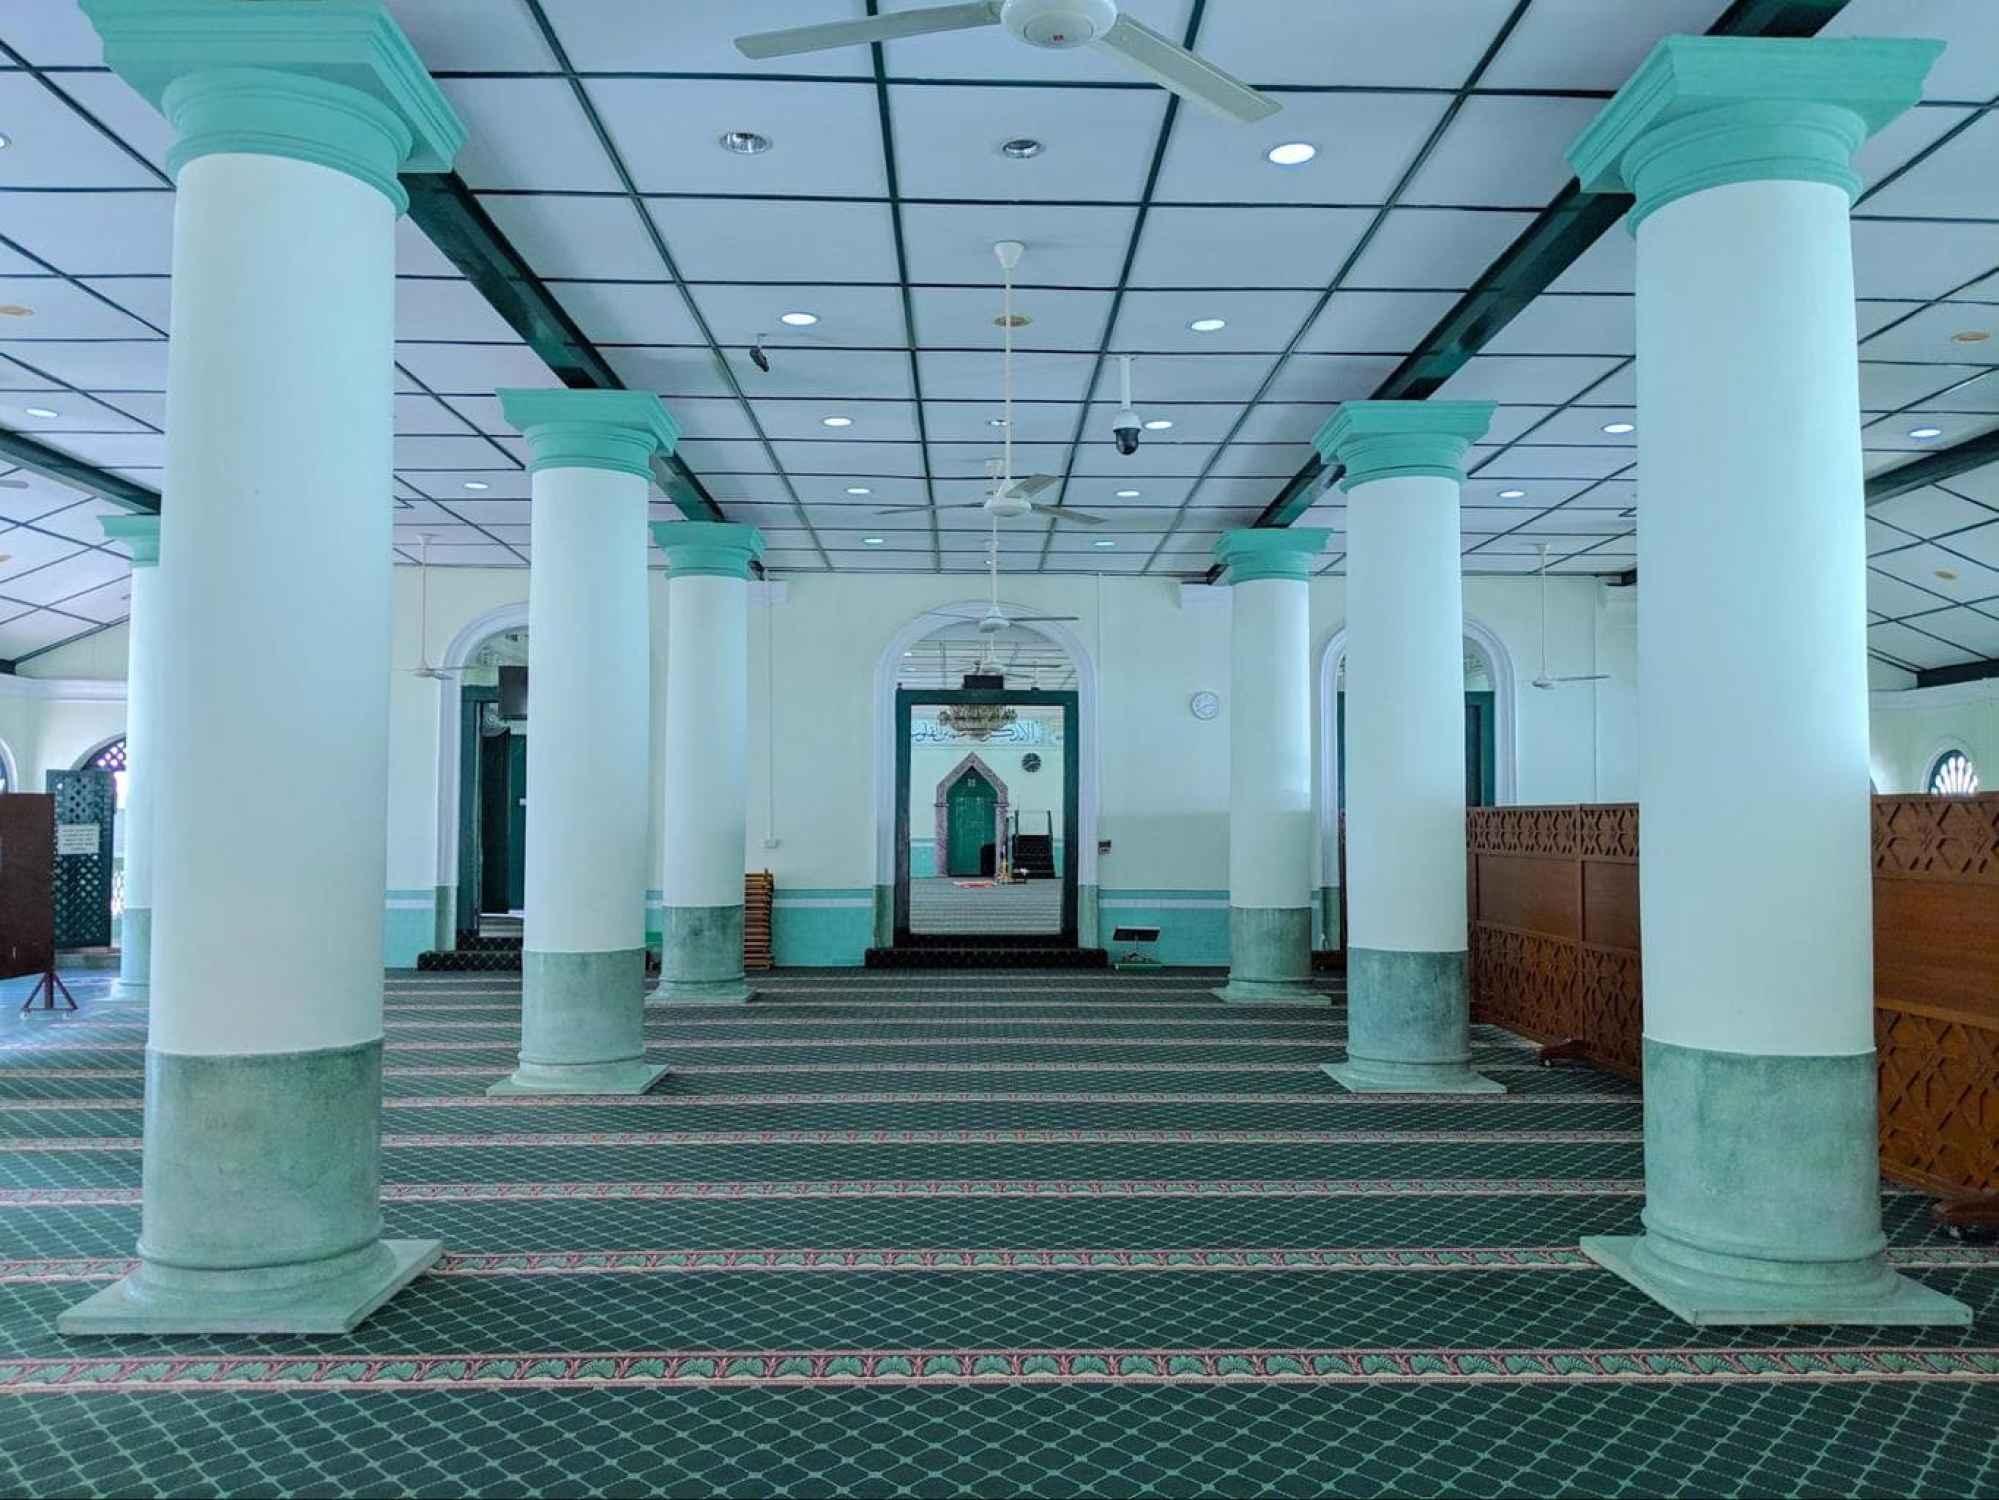 Masjid Jamae interior